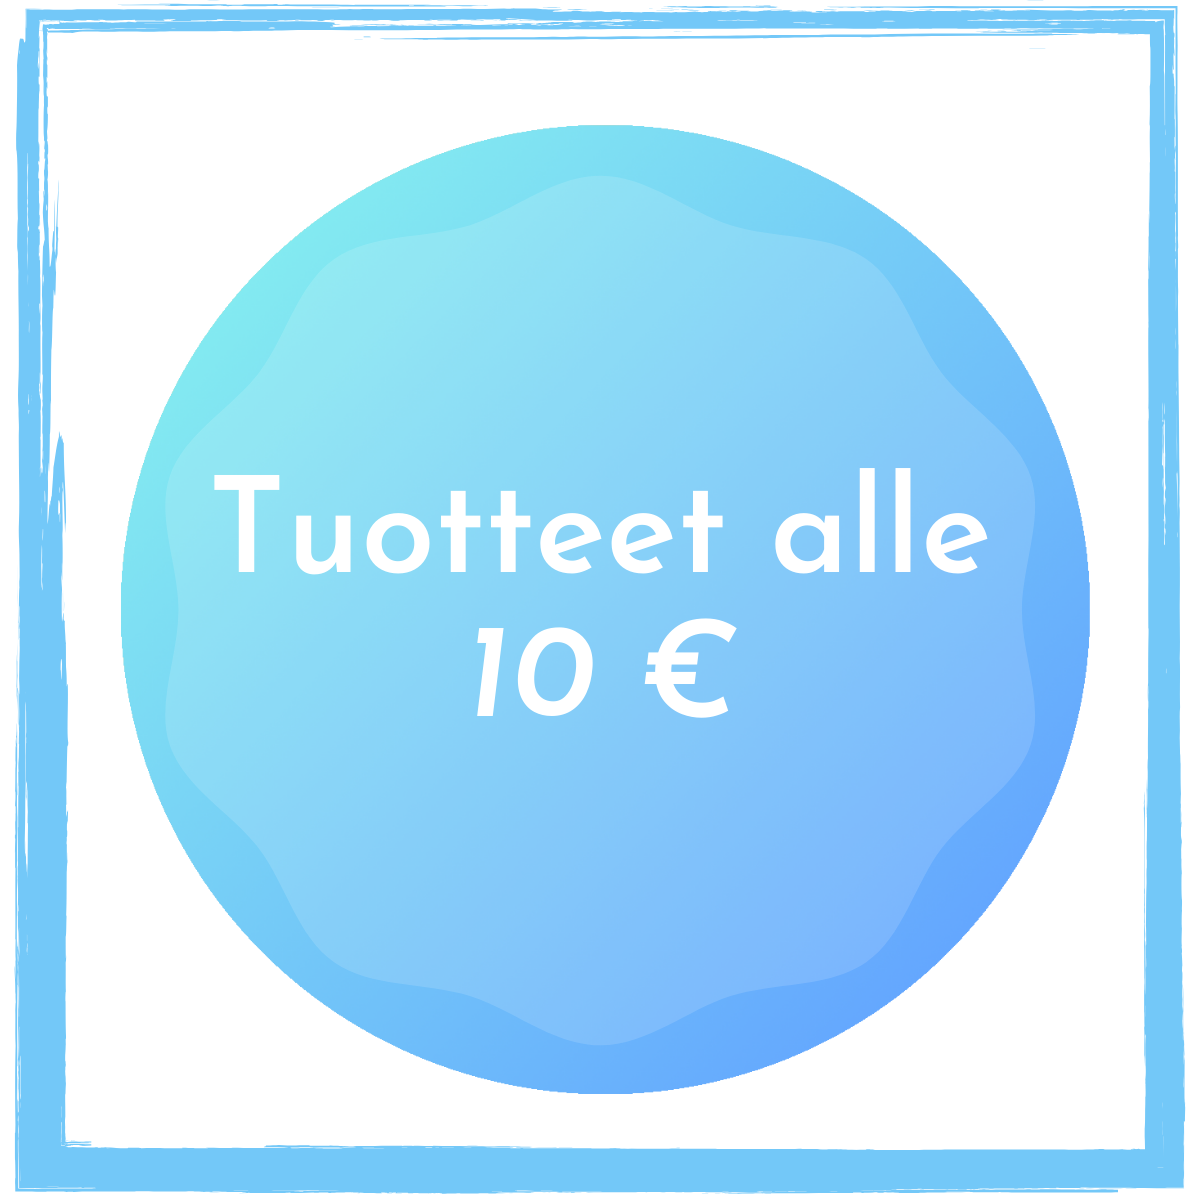 Alle 10 euroa